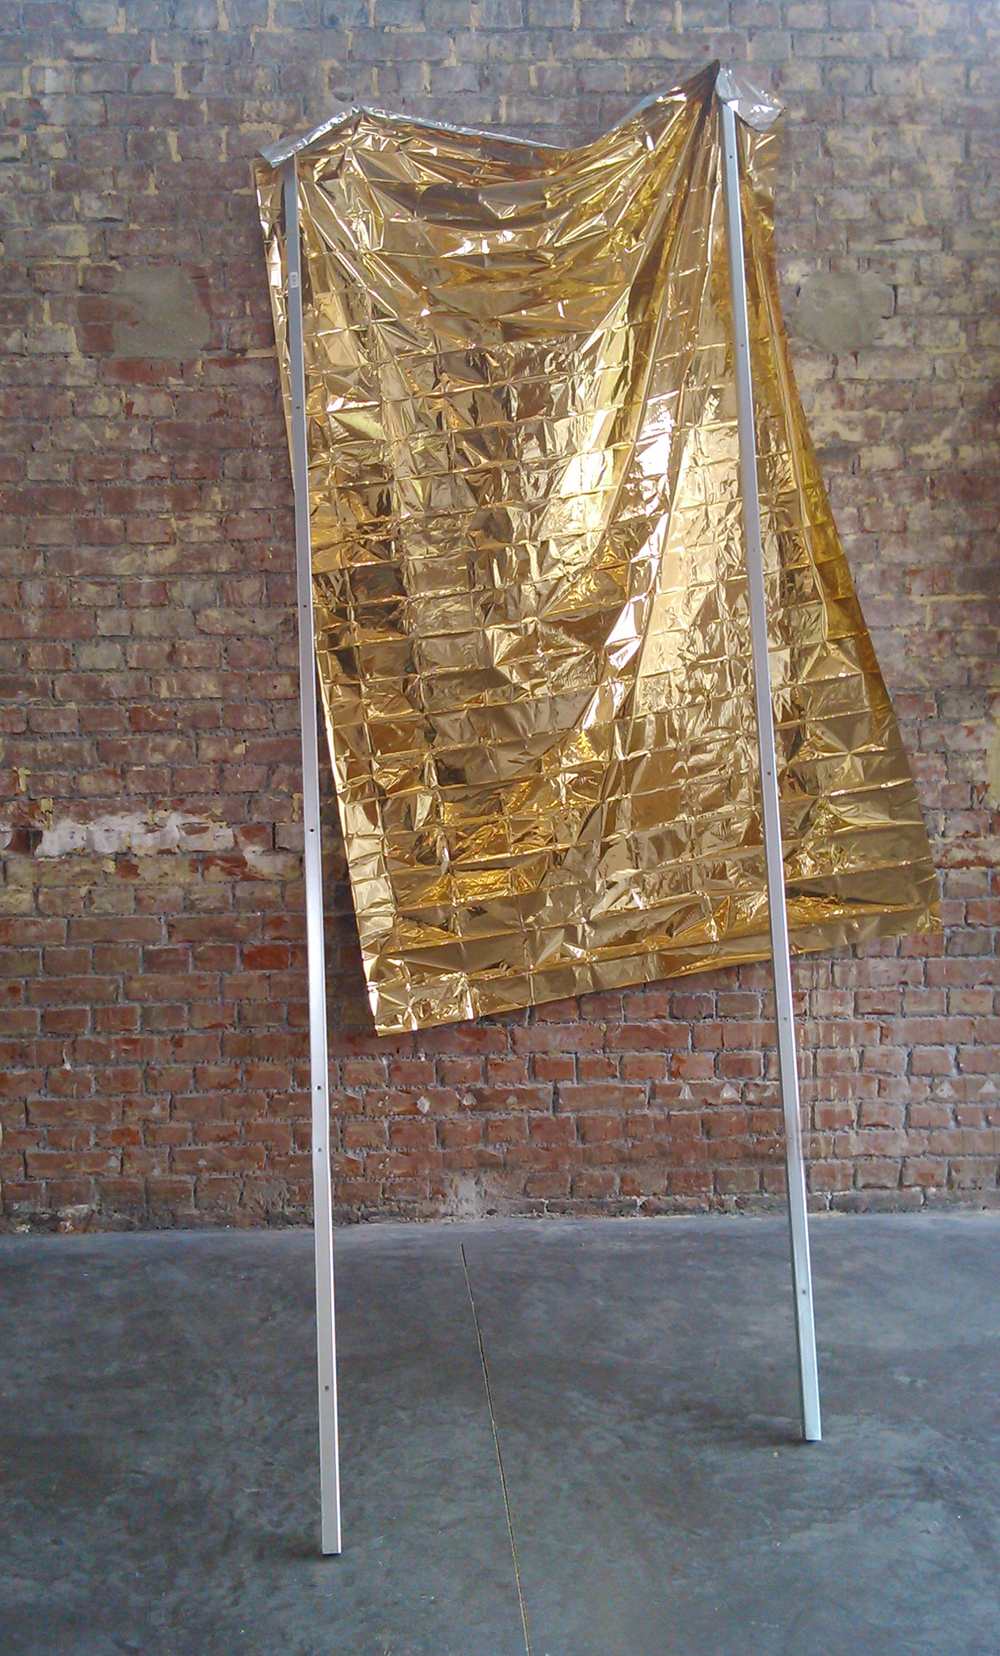 Maintien, 2015, survival blanket, metallic rails, 280 x 120 x 150 cm